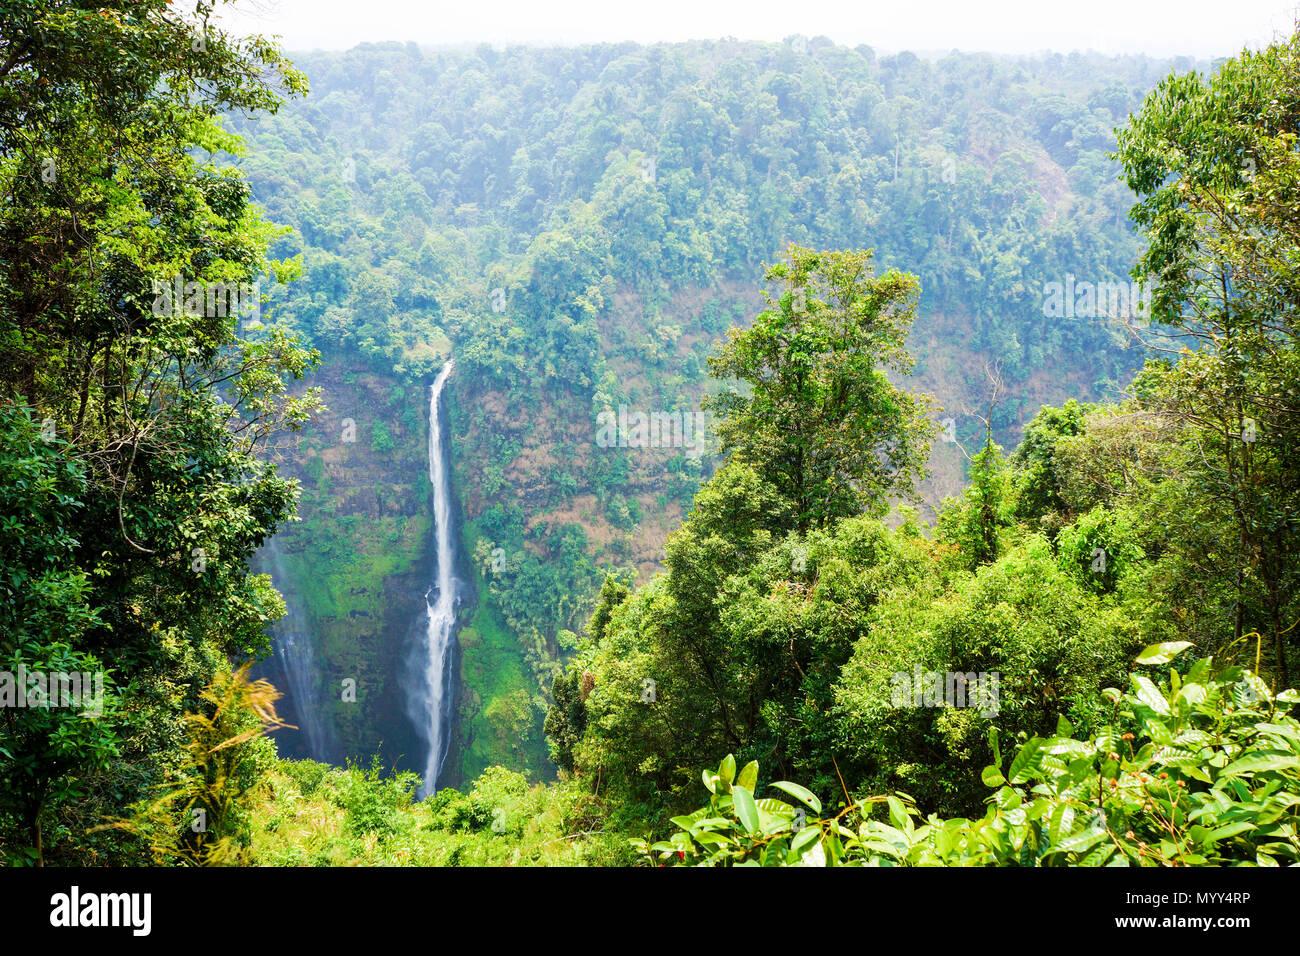 Streaming line Wasserfall von hoher Berg in Laos Stockfoto